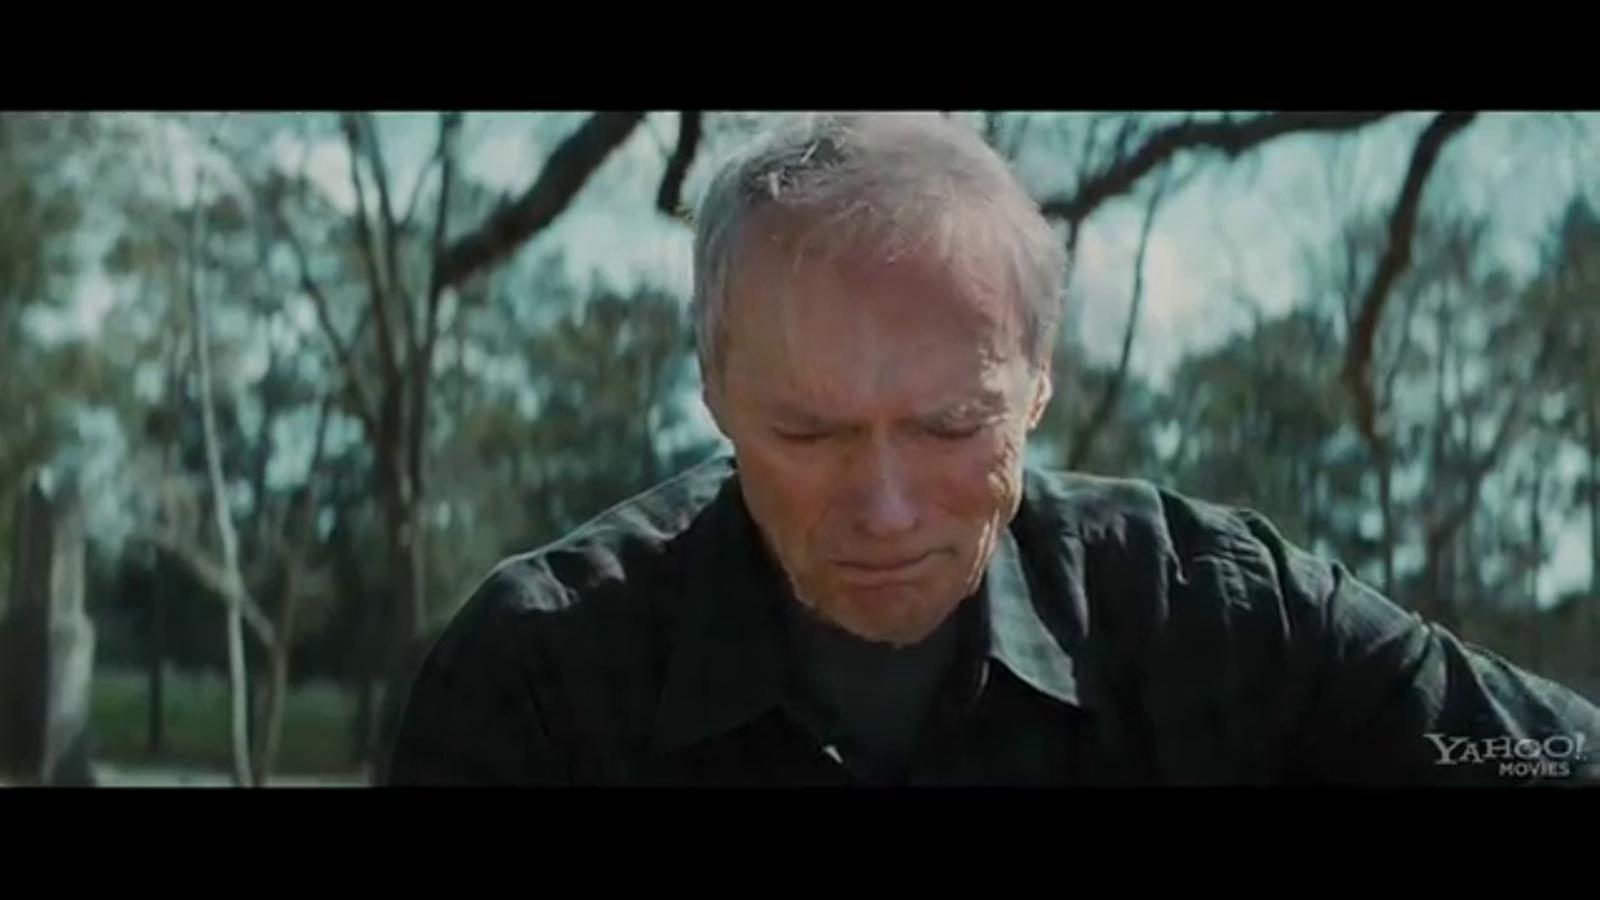 Tràiler de 'Trouble with the curve', el nou film de Clint Eastwood com actor